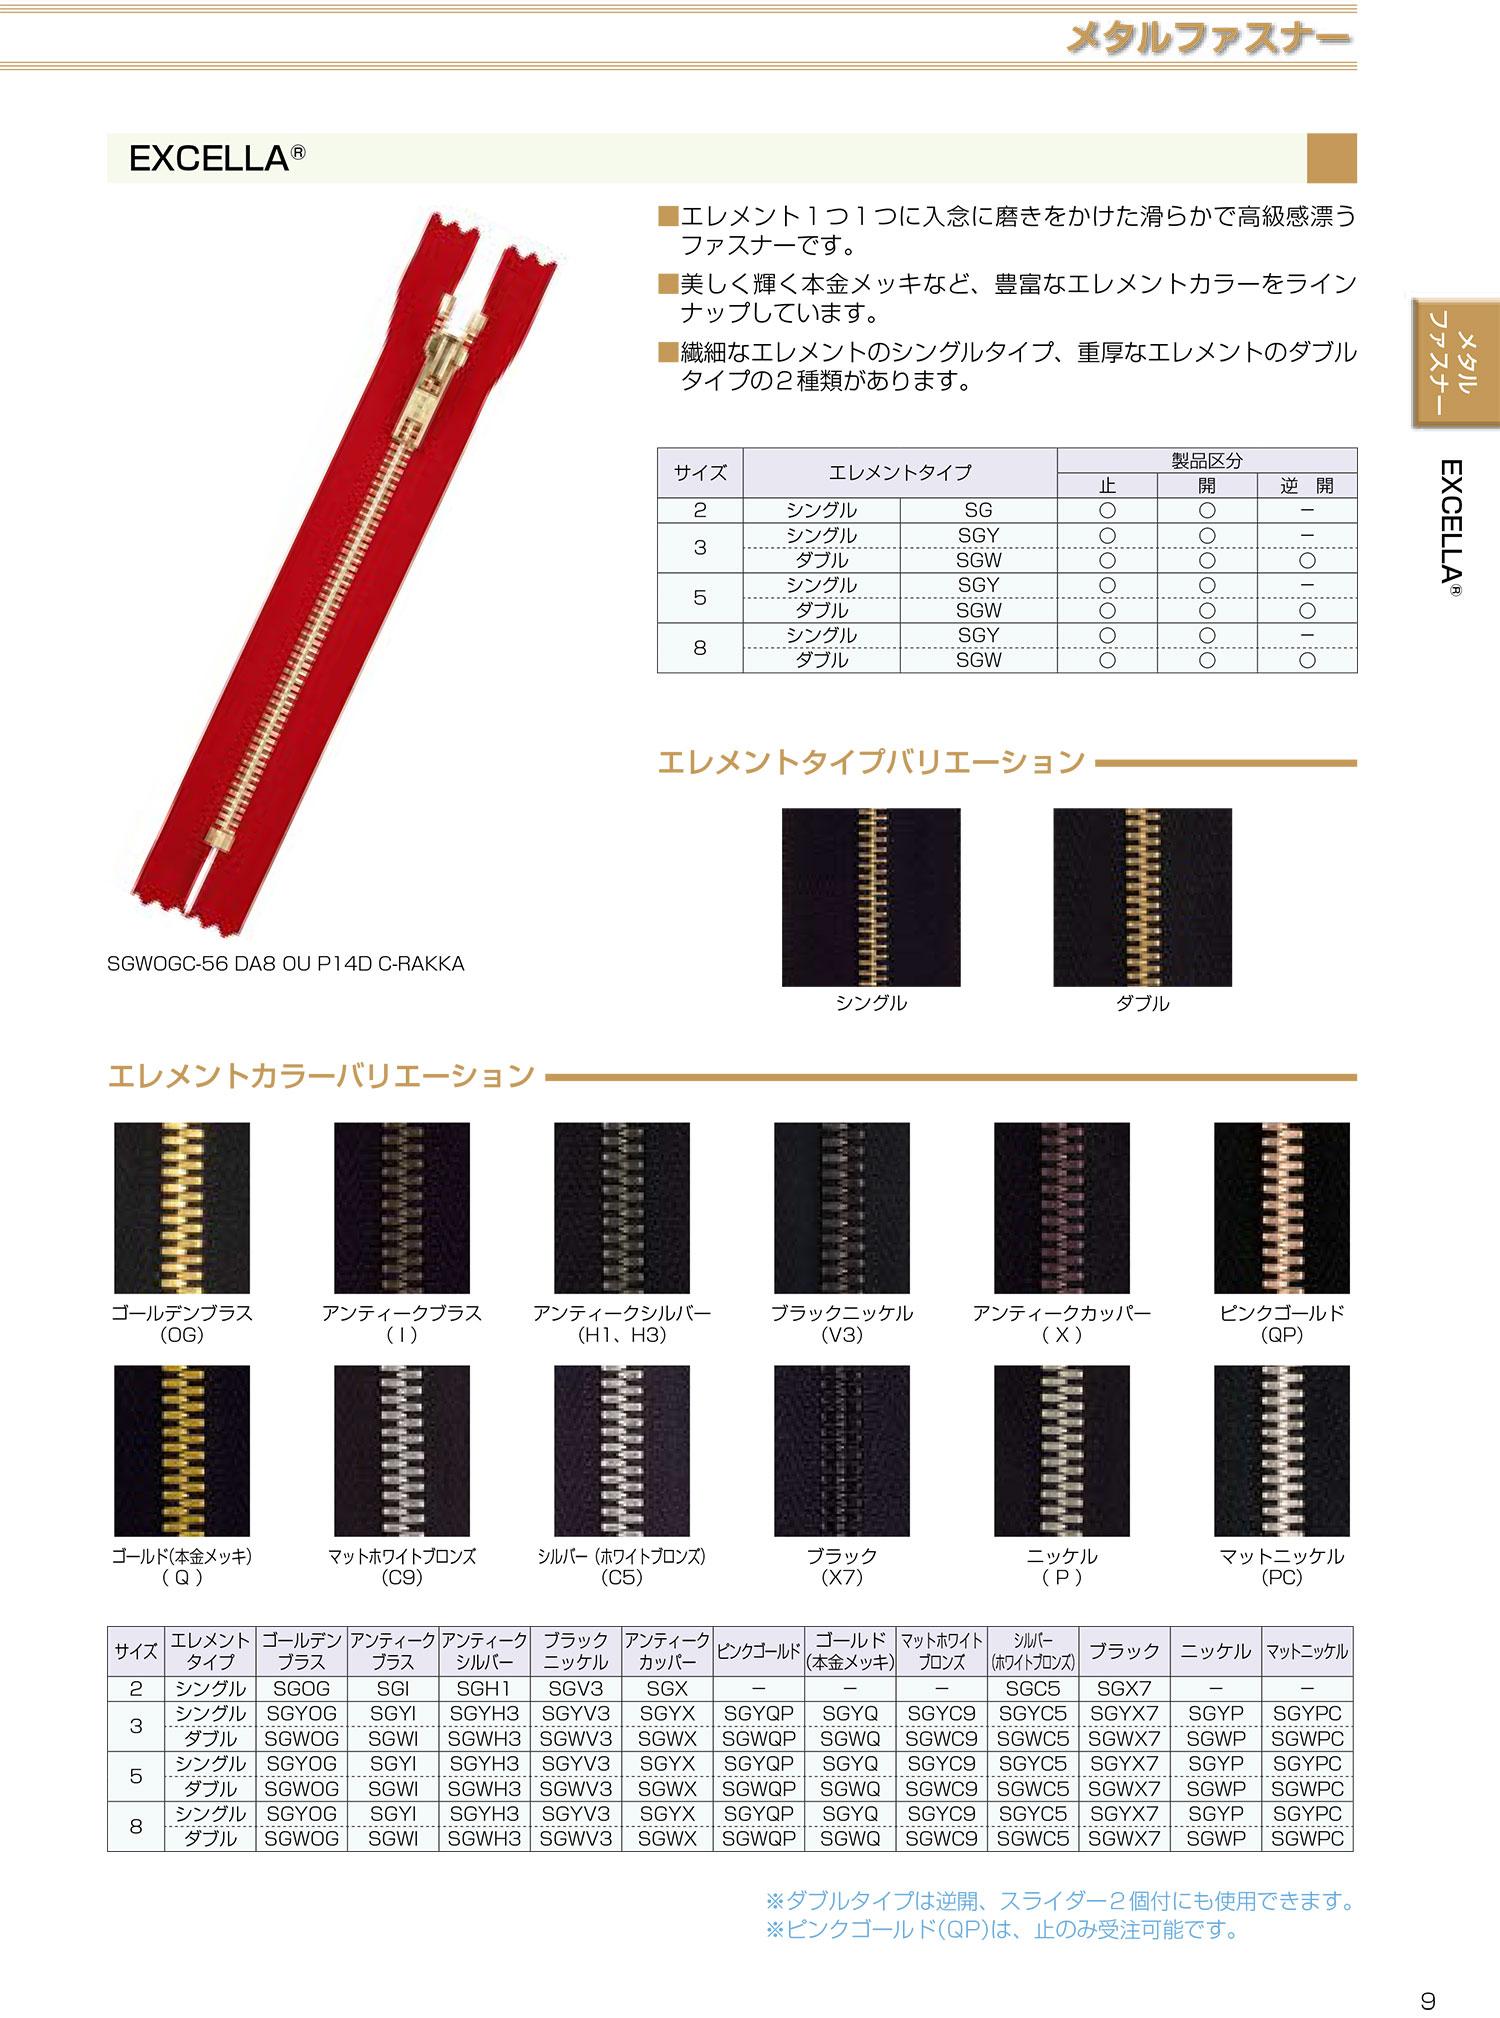 8SGWC9MR エクセラ 8サイズ マットホワイトブロンズ 逆開 ダブル[ファスナー] YKK/オークラ商事 - ApparelX アパレル資材卸通販